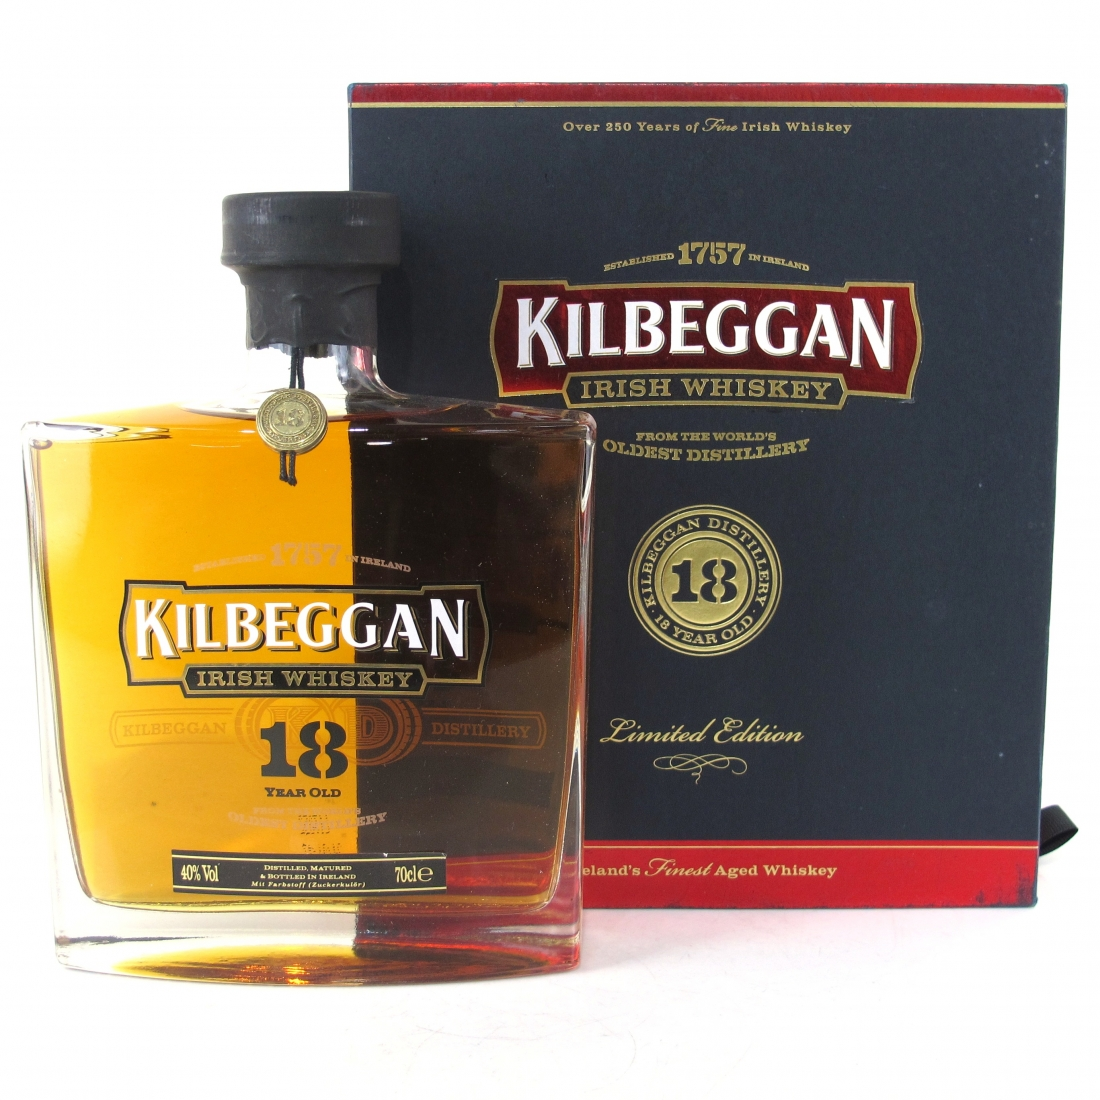 Kilbeggan 18 Year Old